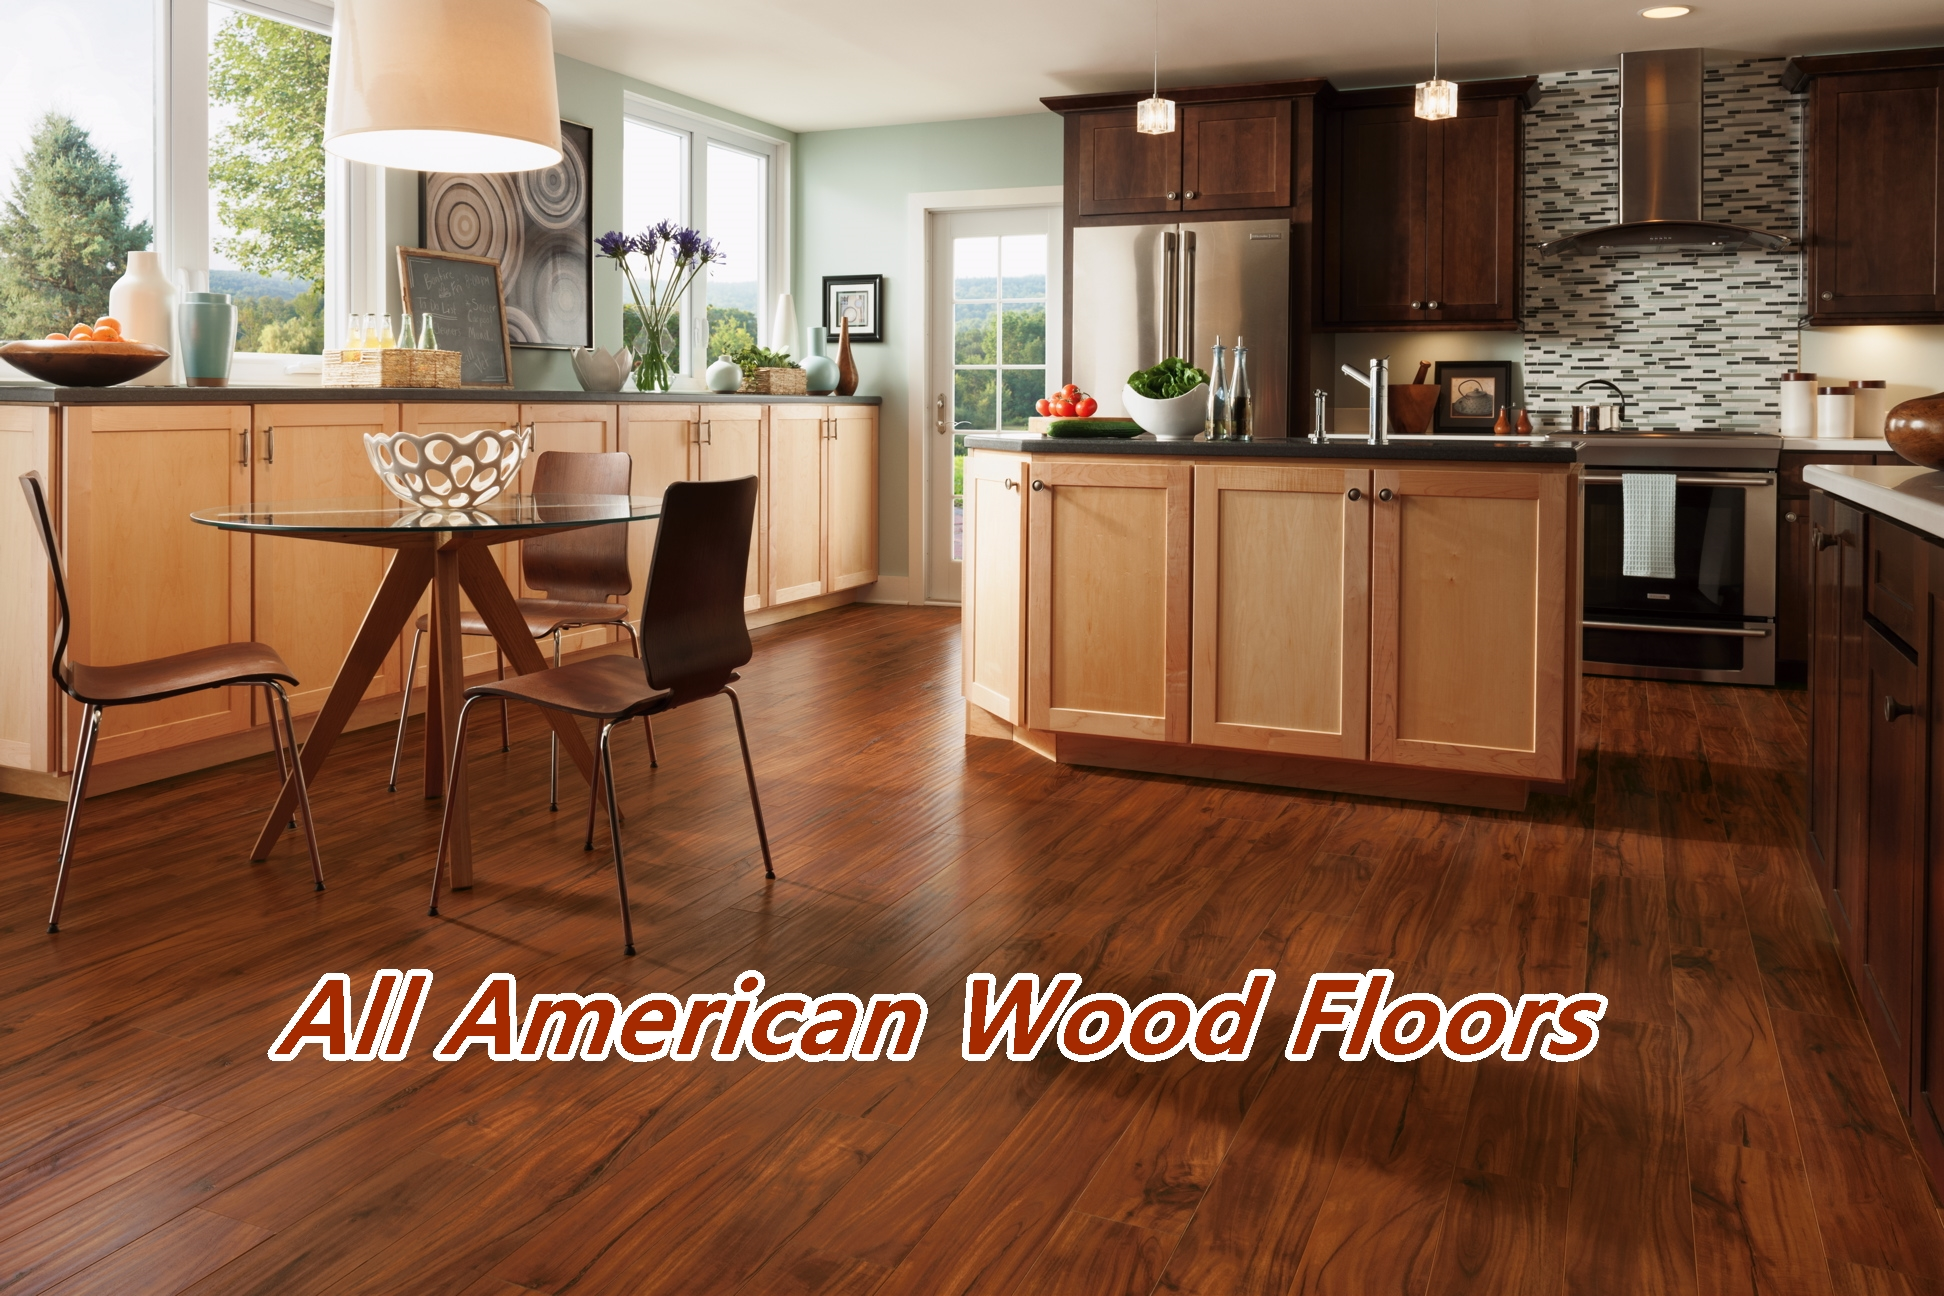 hardwood kitchen wood floors All American Wood Floors Orlando Winter Park Melbourne Hardwood Installation